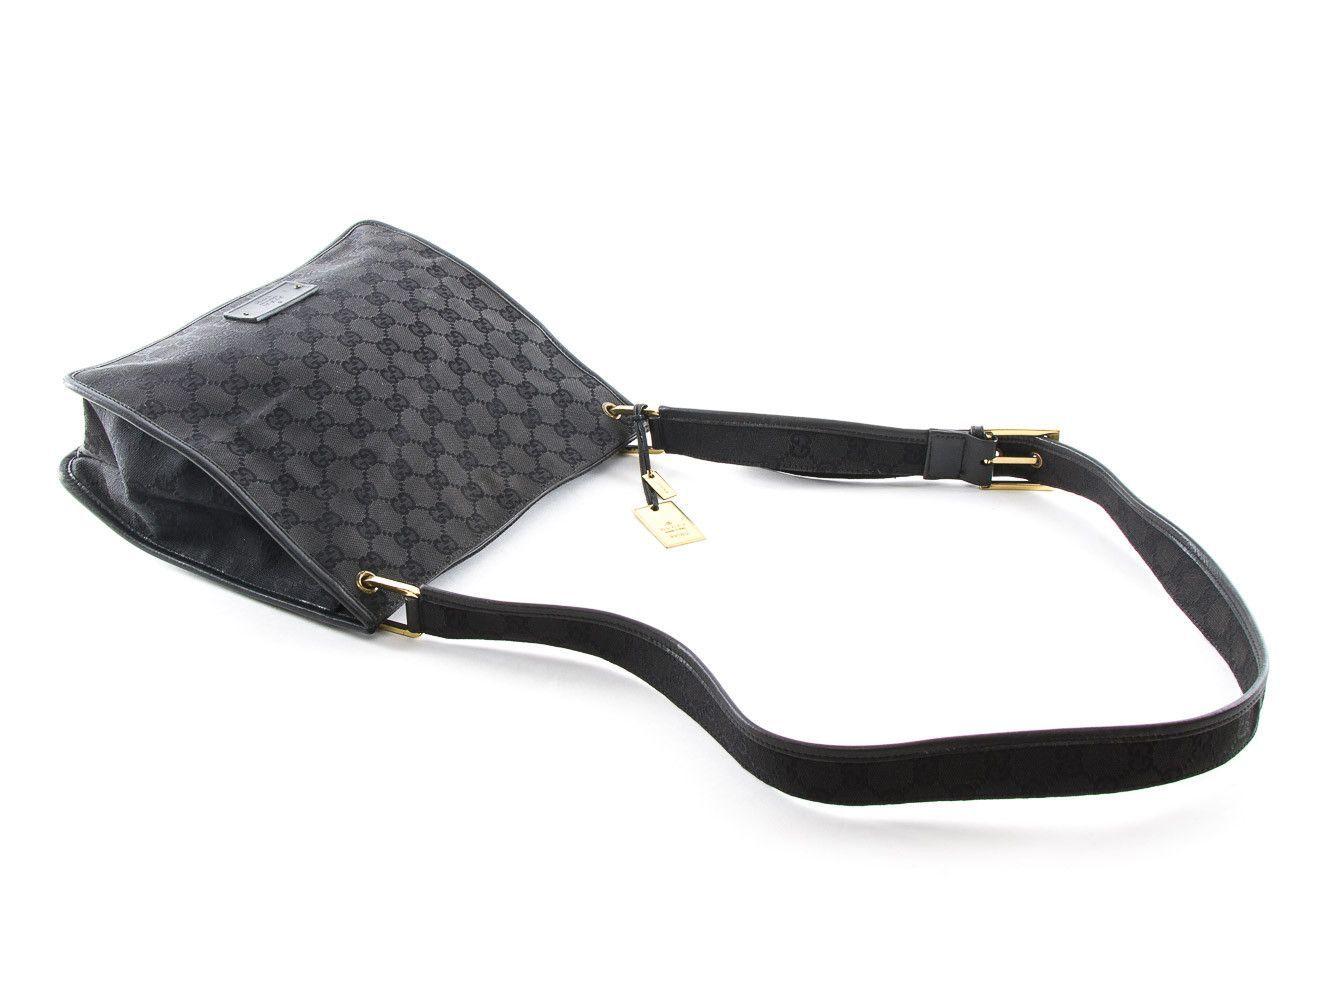 5a45280f7b6d Authentic Gucci black crossbody messenger bag signature GG monogram ...